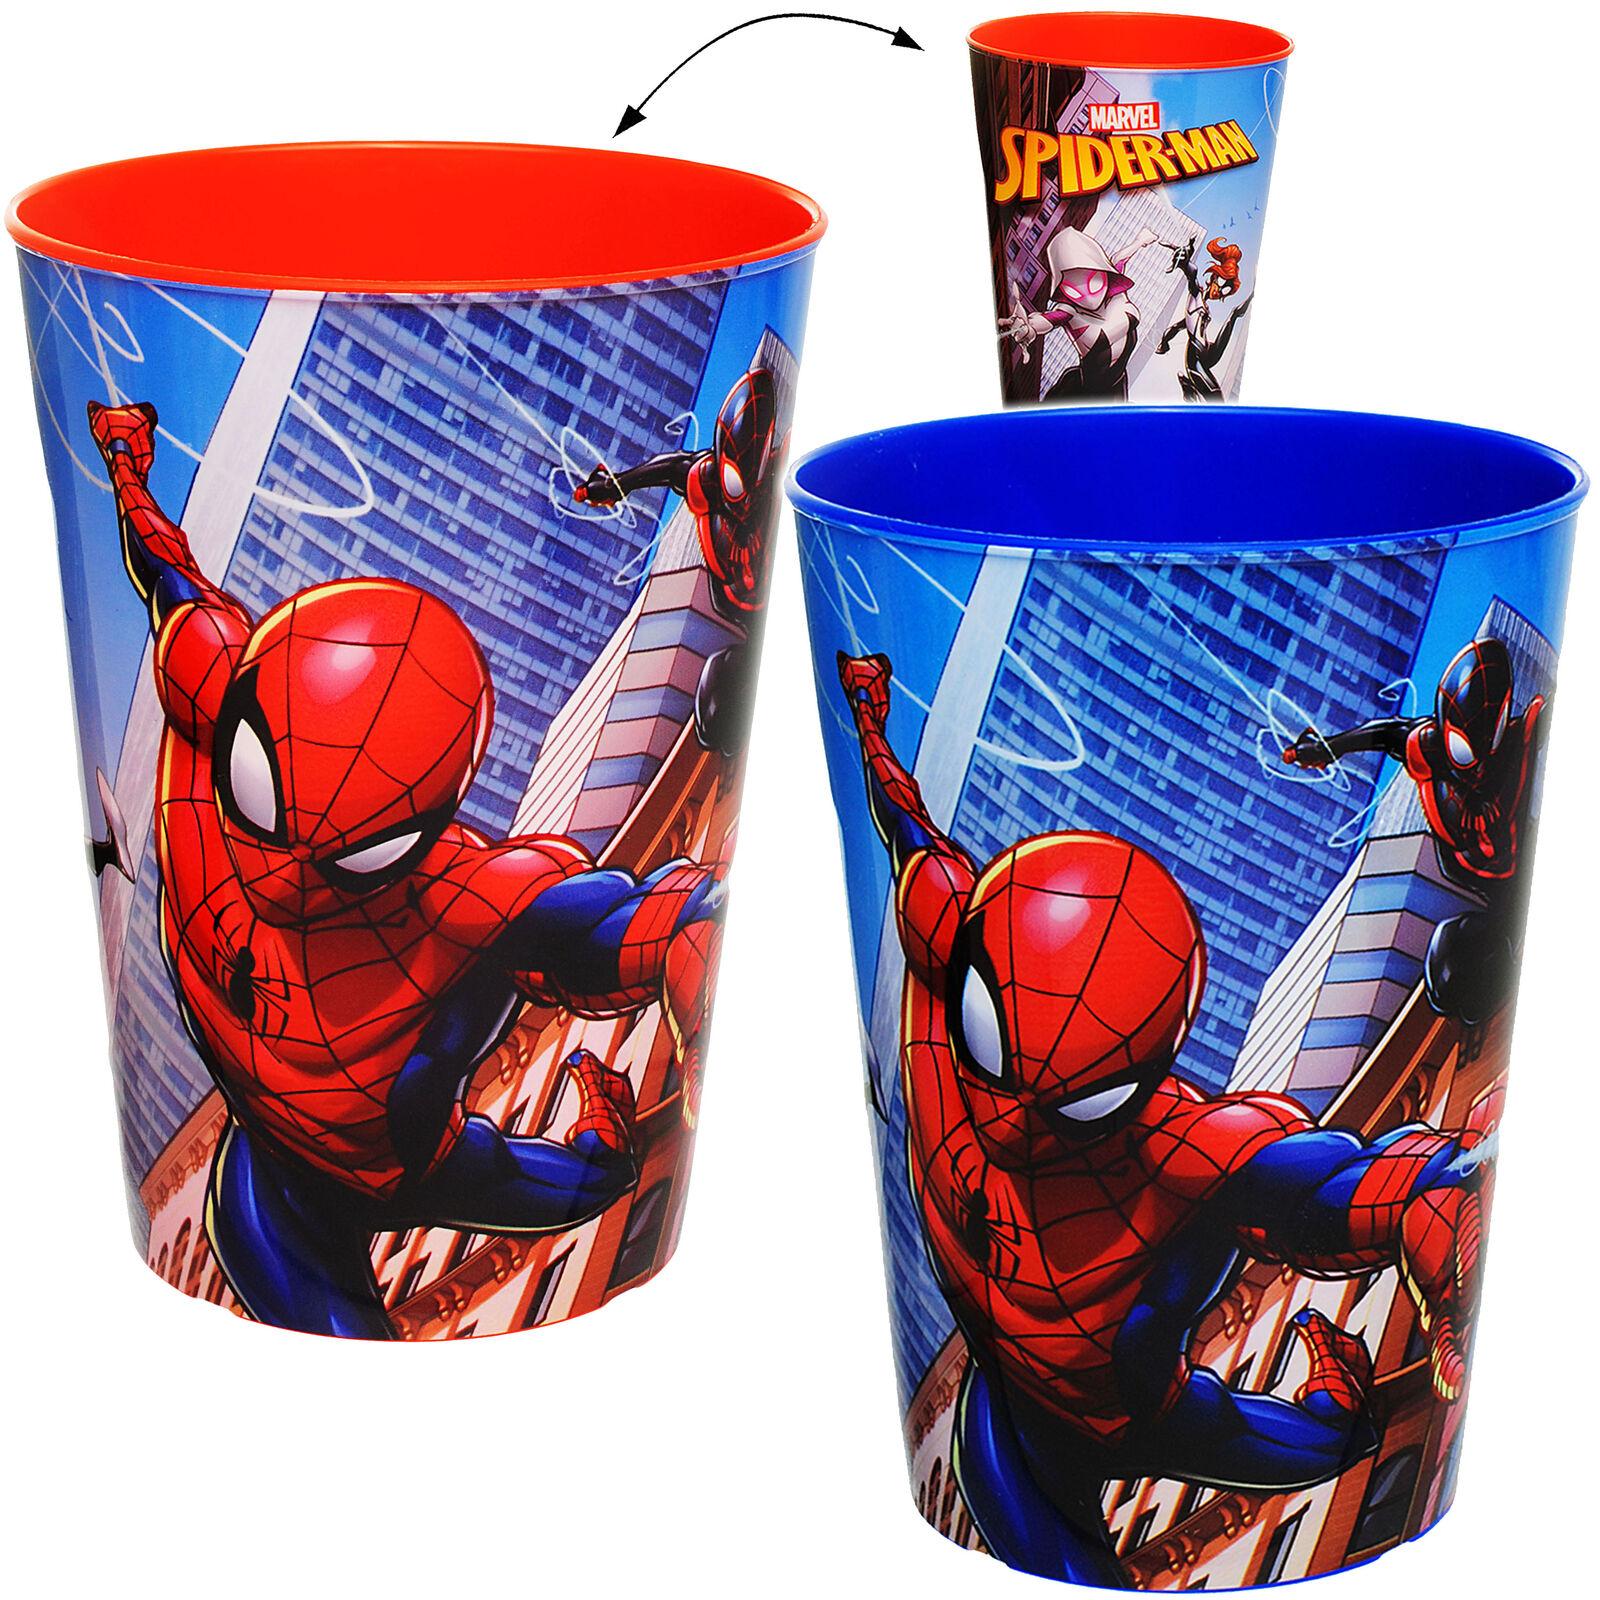 "3 in 1 - Trinkbecher / Zahnputzbecher / Malbecher - Becher - "" ultimate Spider-M"